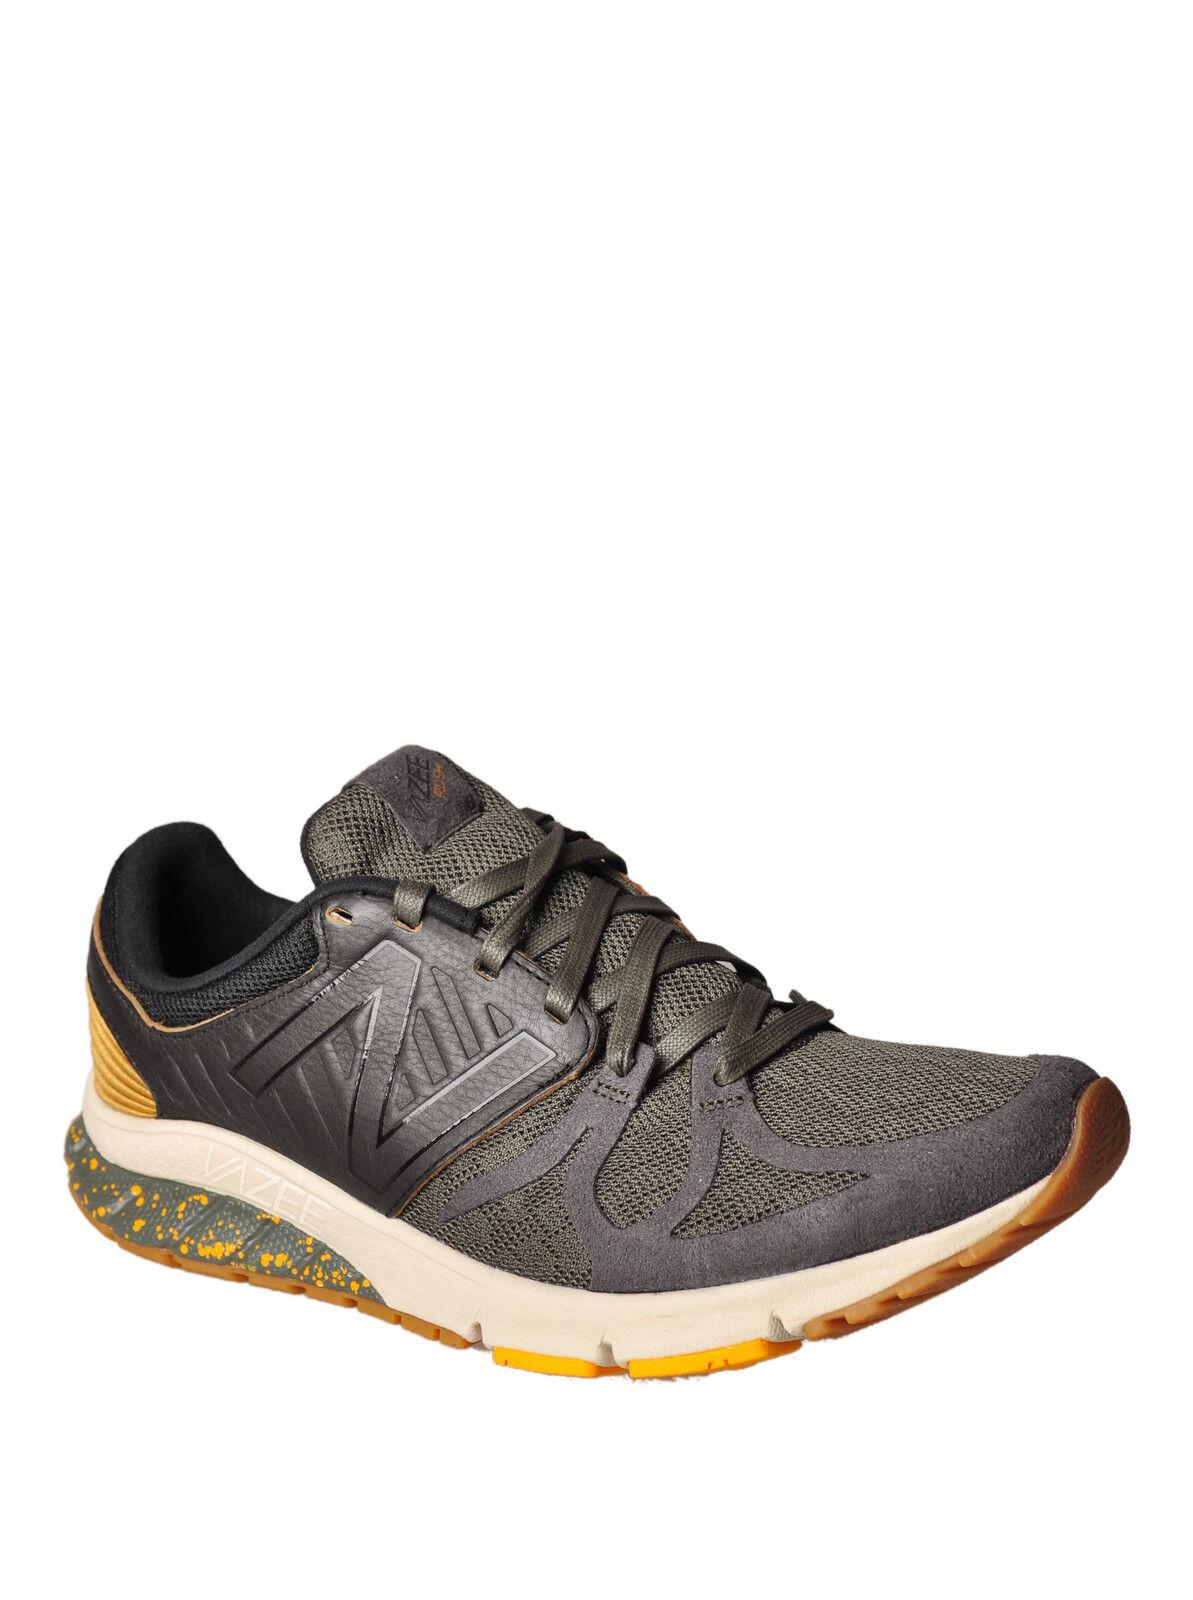 New Balance  -  Sneakers - Male - 41.5 - Brown - 1569726B161753